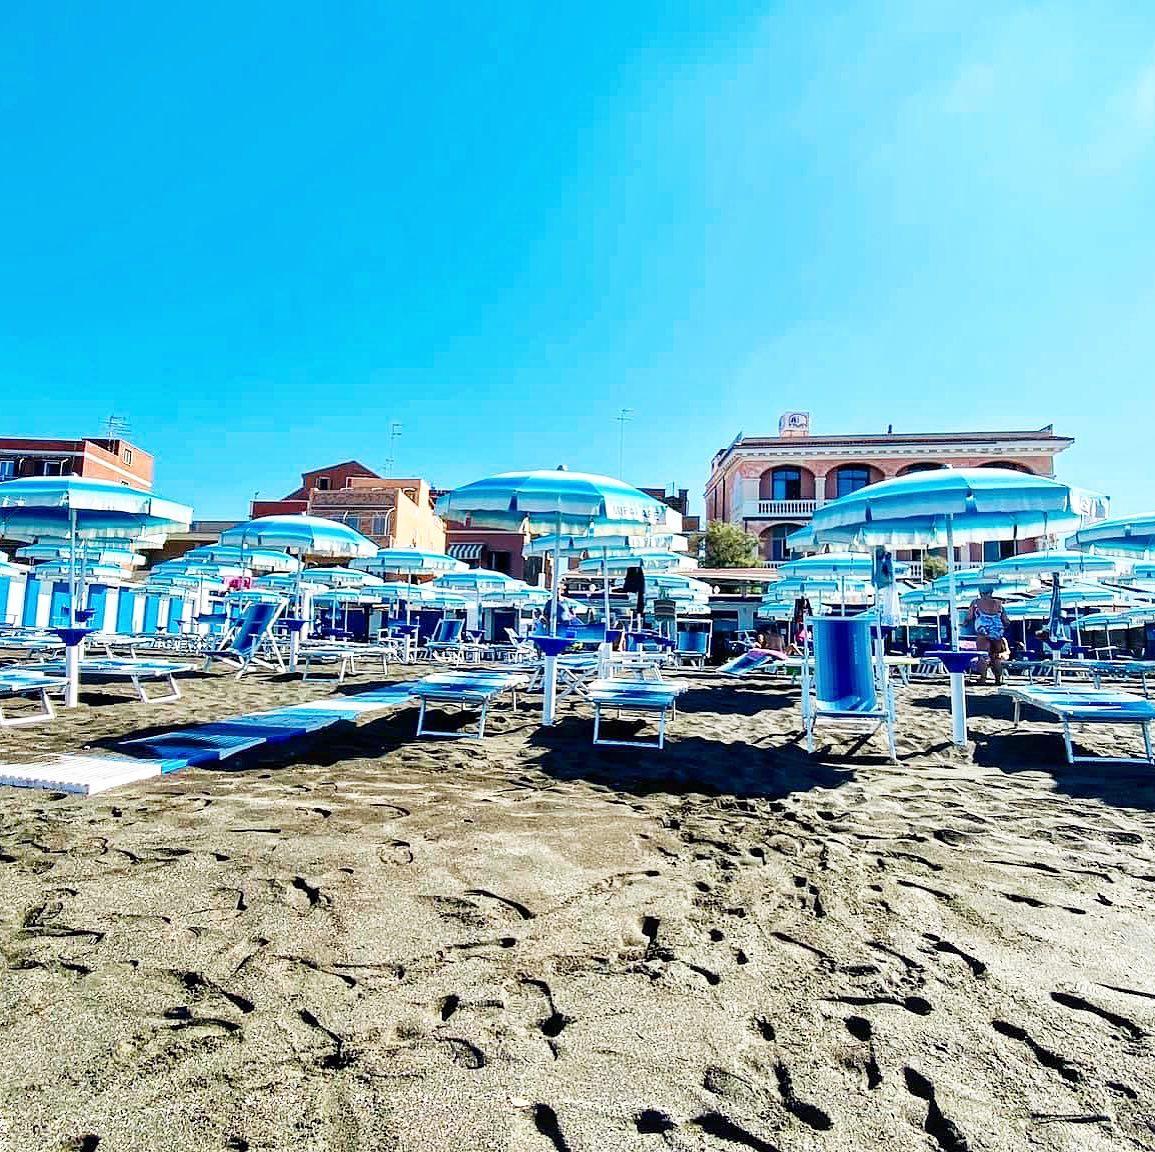 Miramare Beach